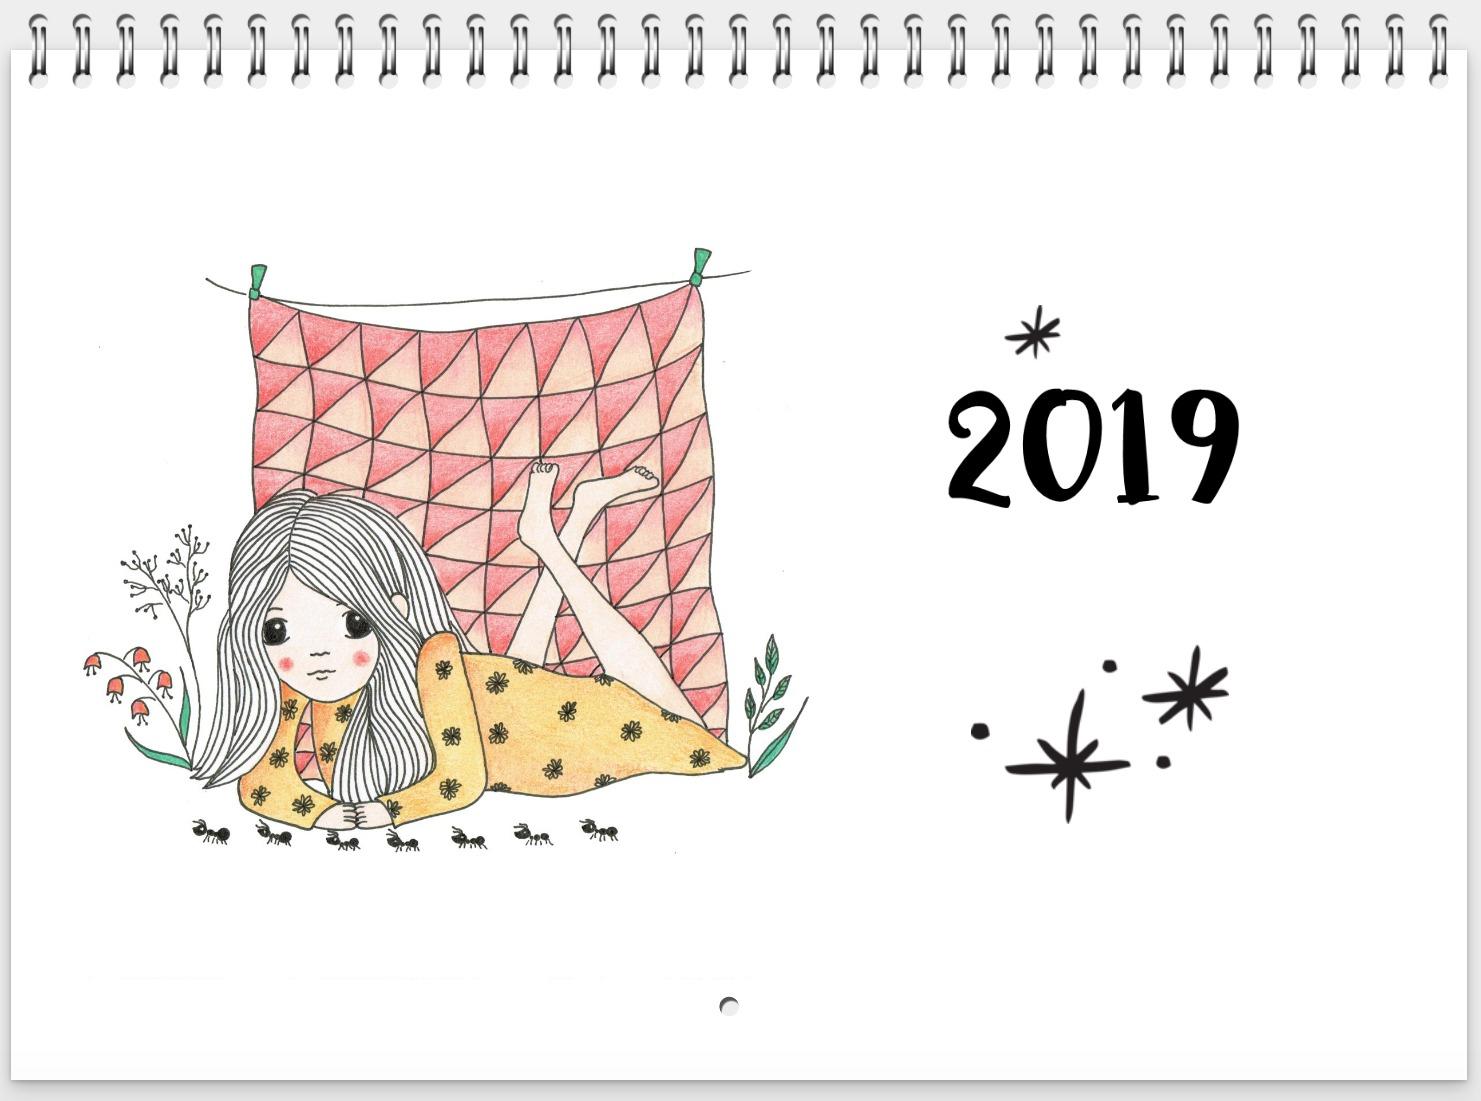 jaarkalender - kalender 2019 - kinderkamervintage - unieke illustraties